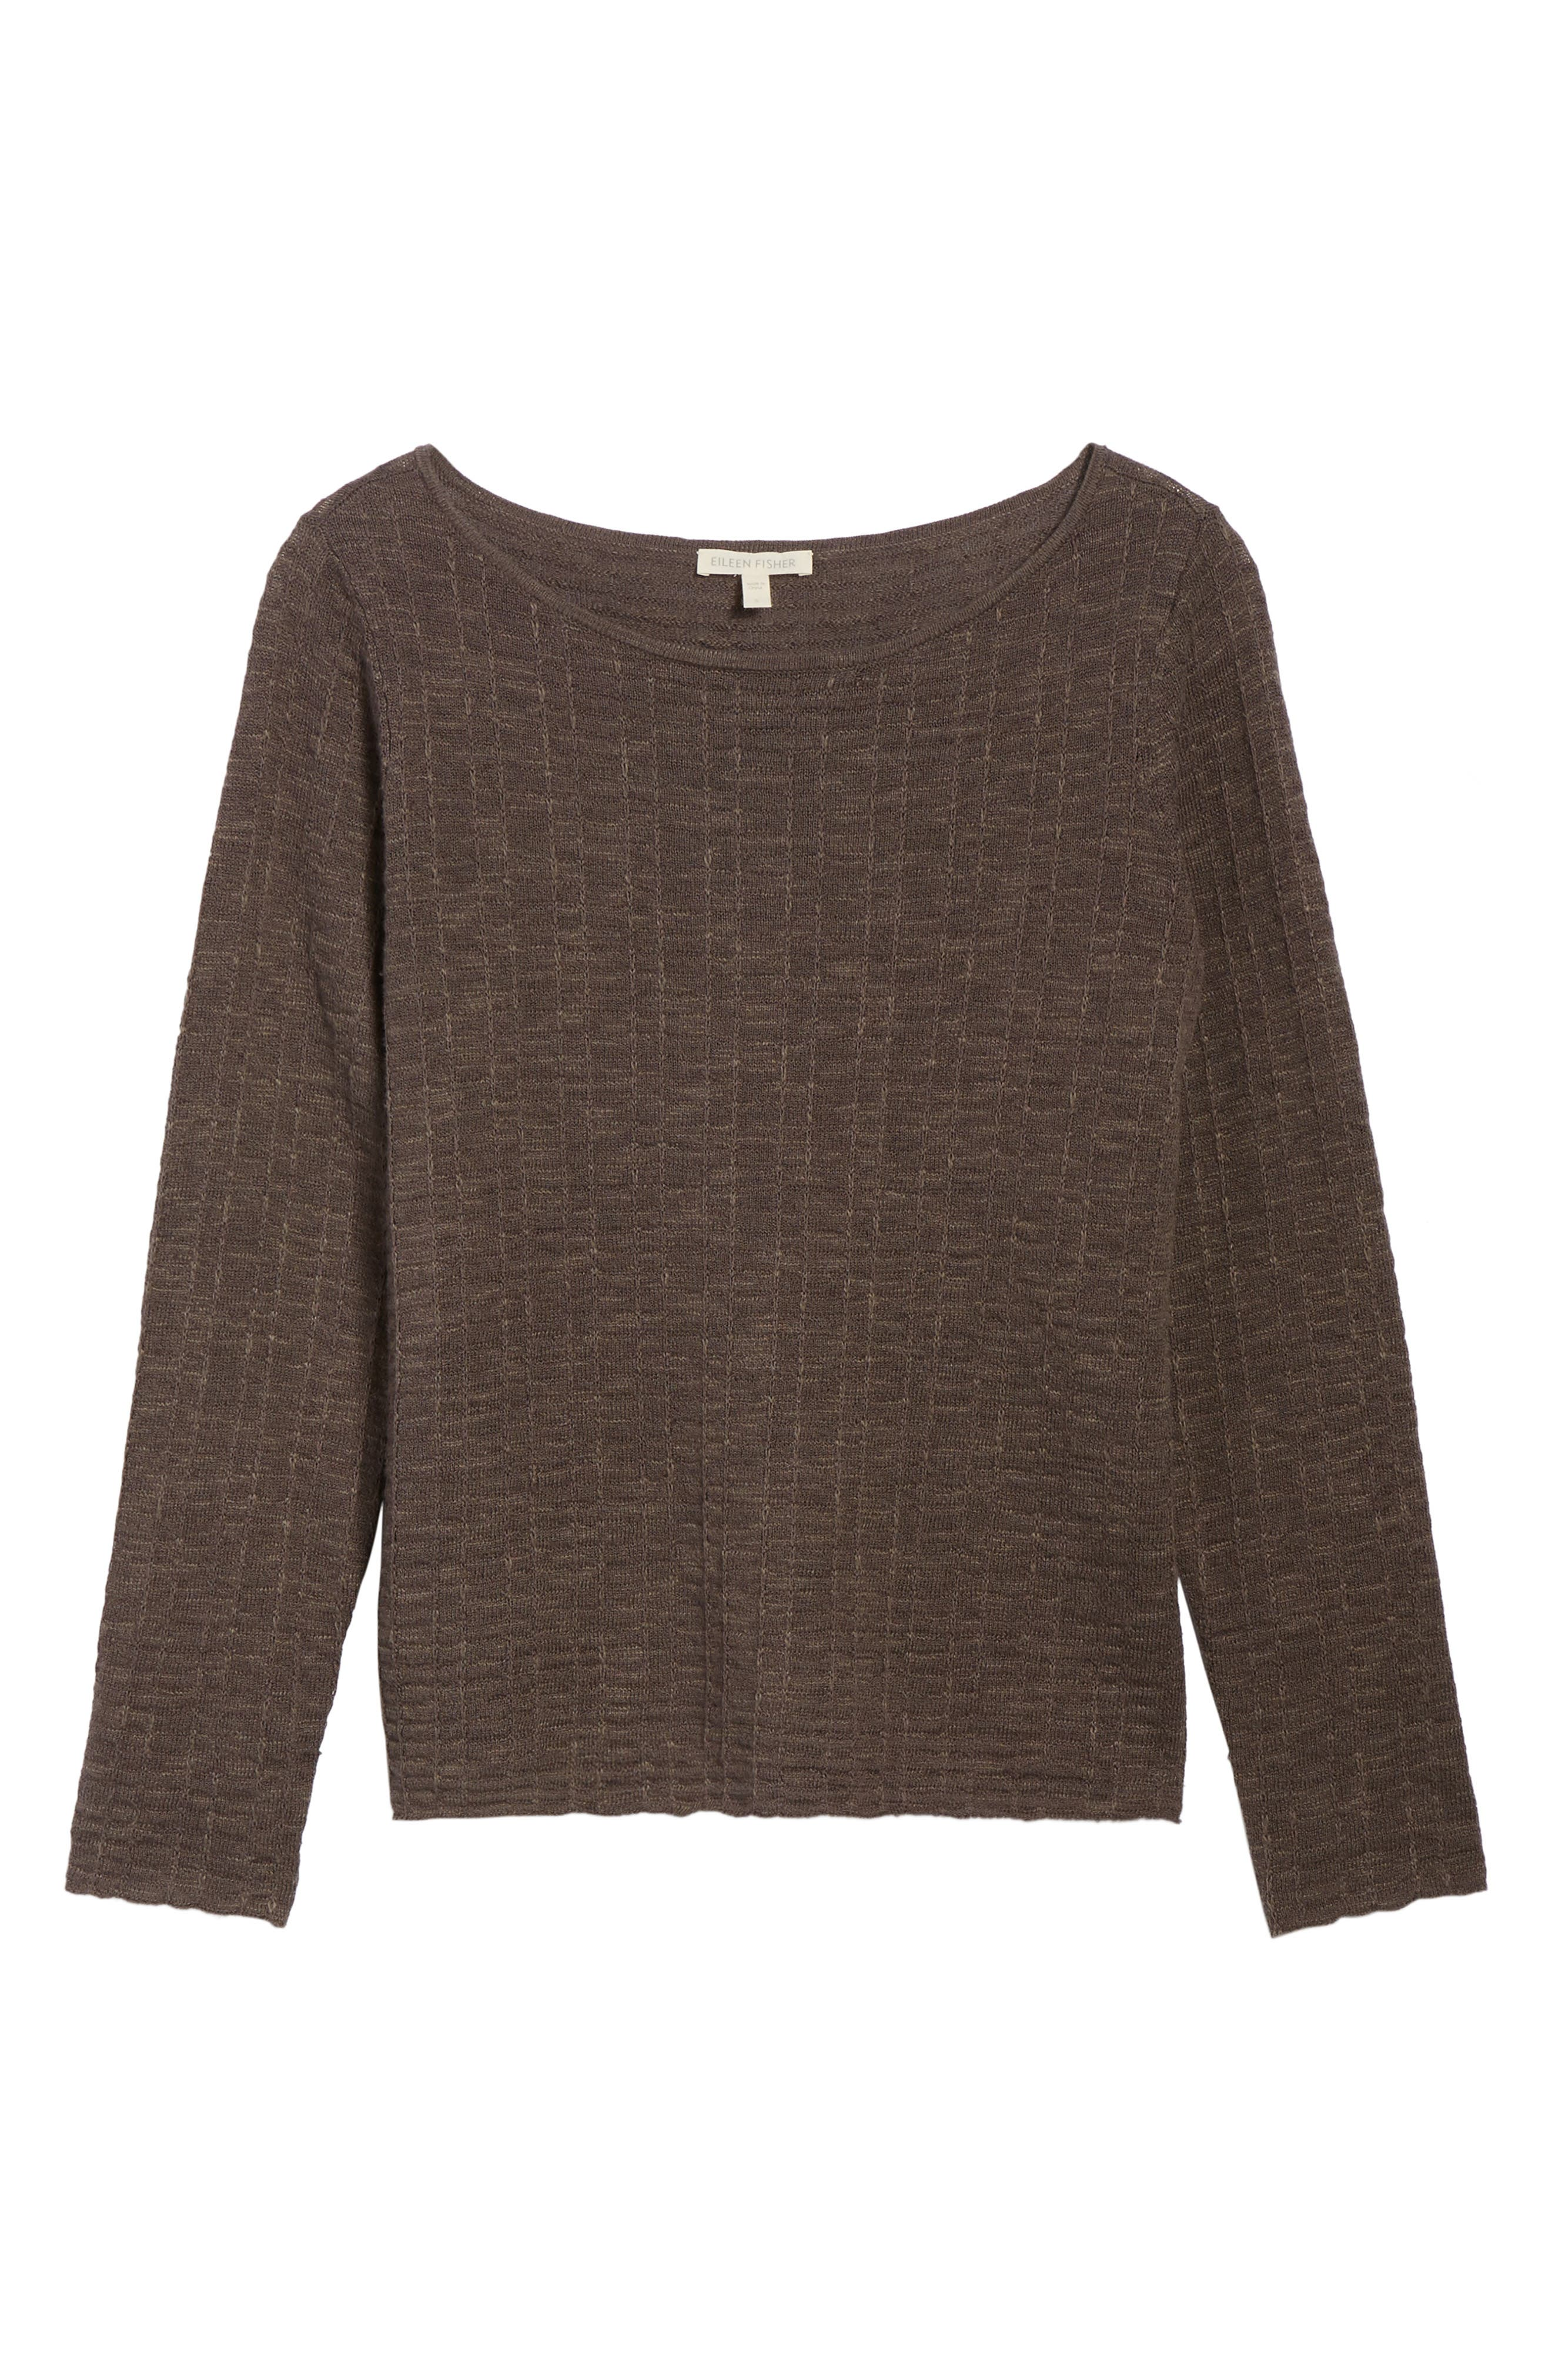 Organic Linen & Cotton Sweater,                             Alternate thumbnail 6, color,                             024